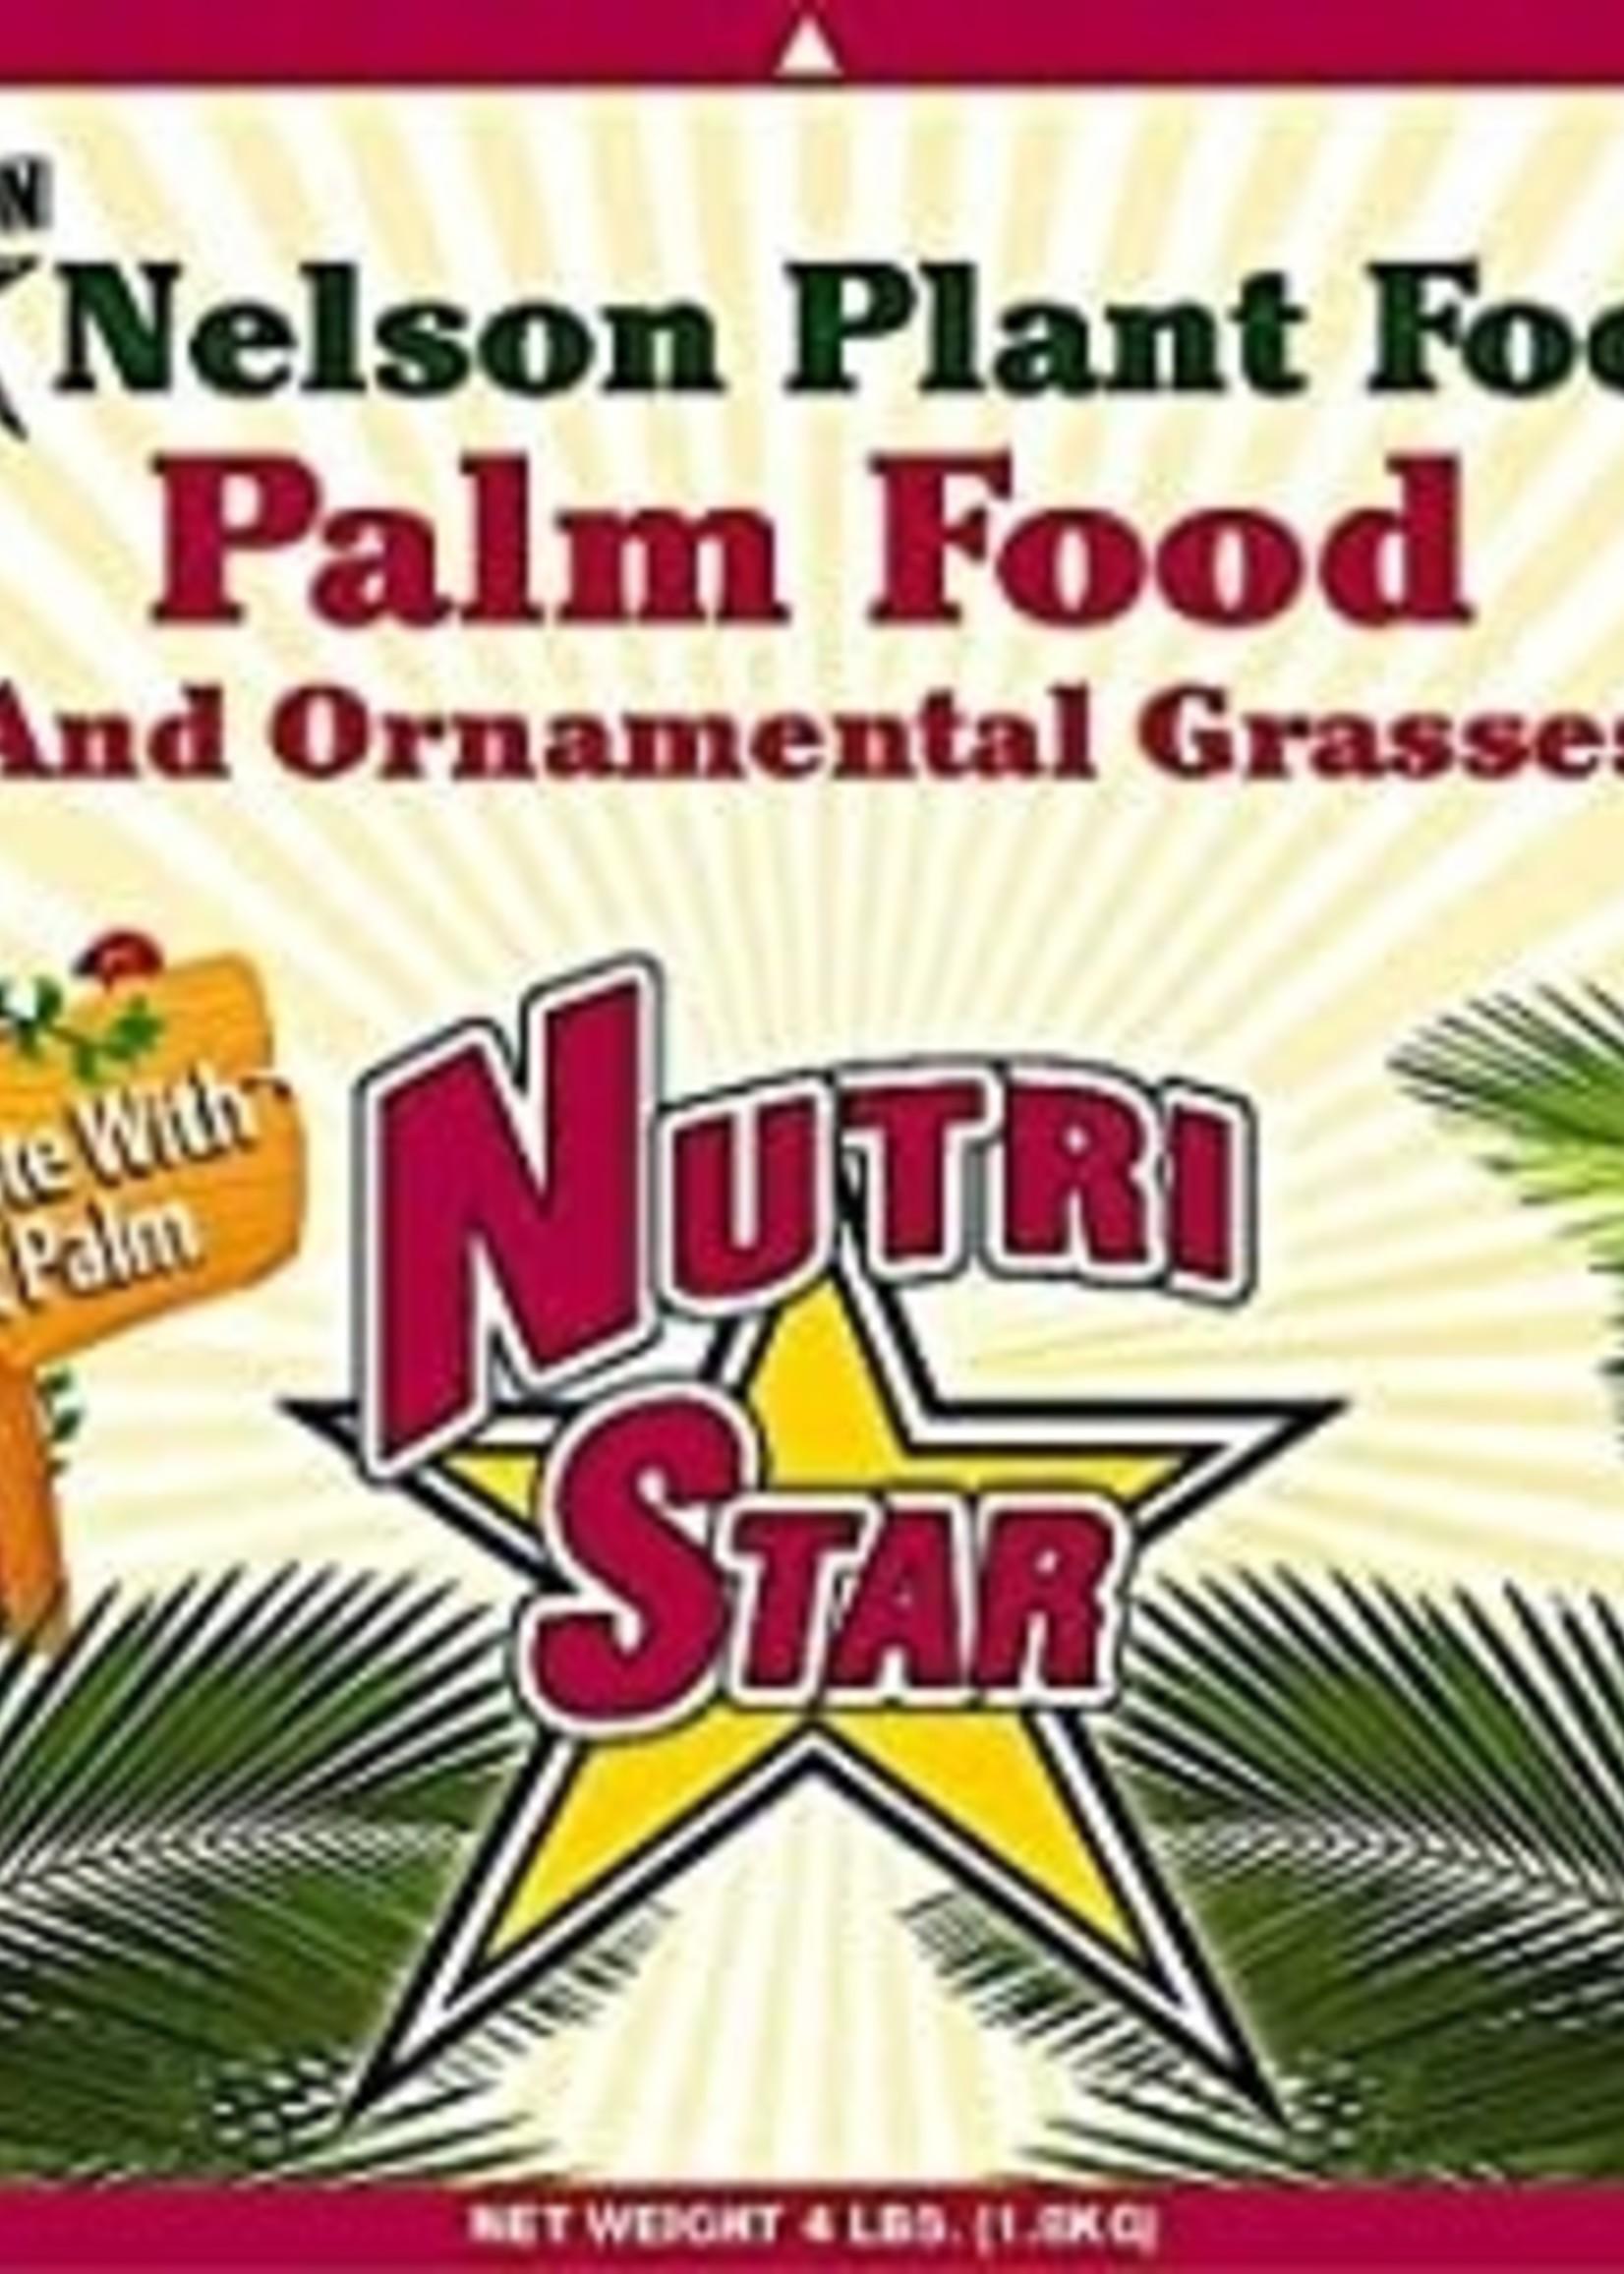 Nelsons Palm Fertilizer 4#